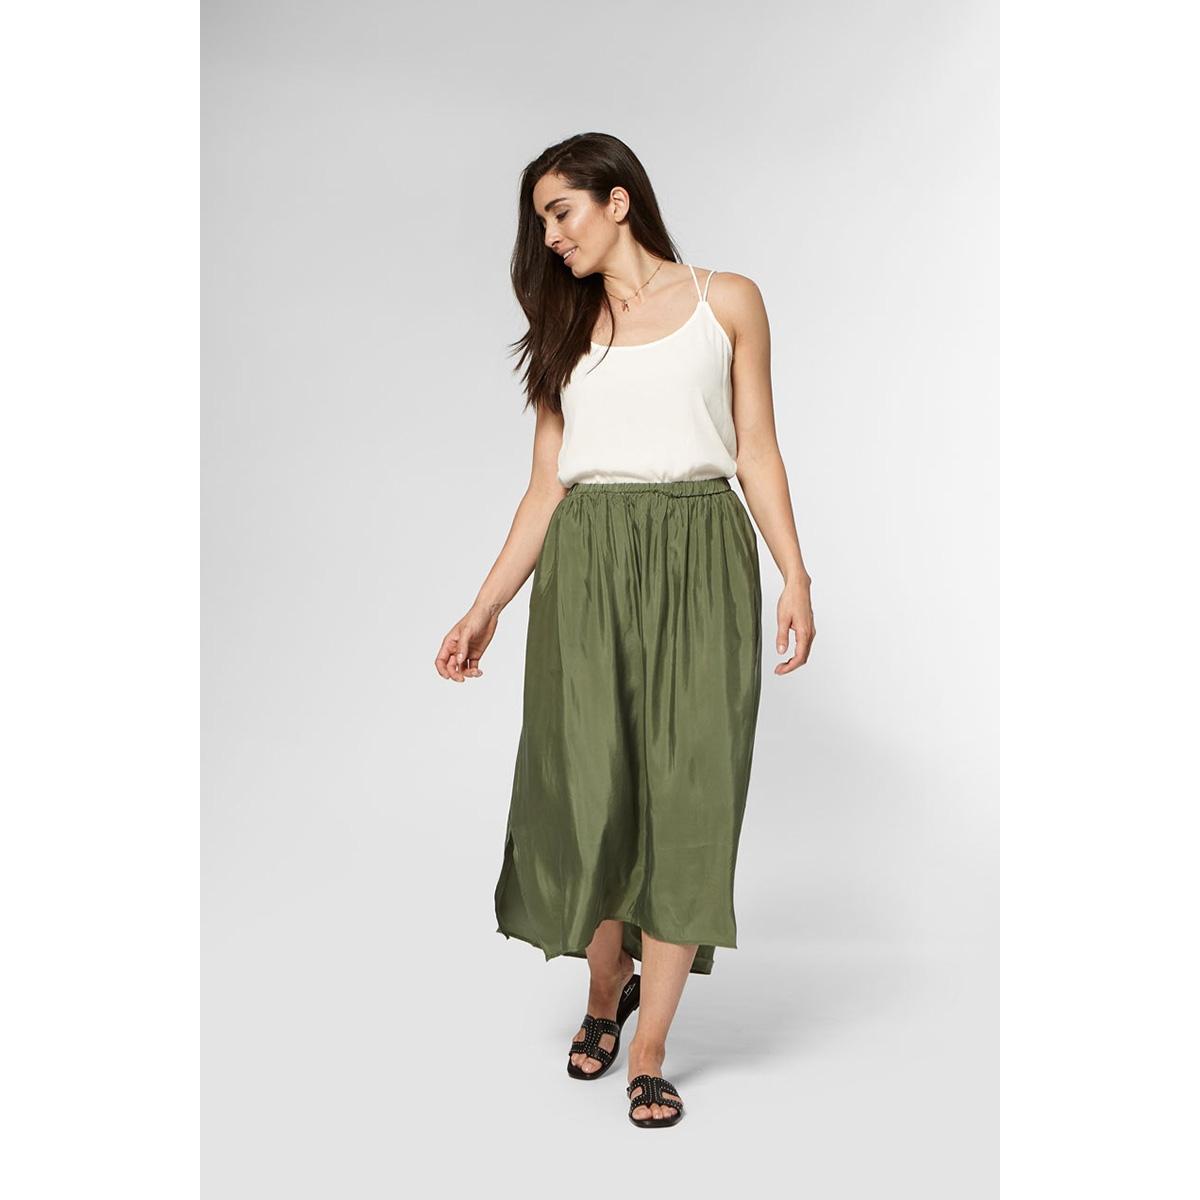 jezebel skirt s20 46 3672 circle of trust rok seaweed